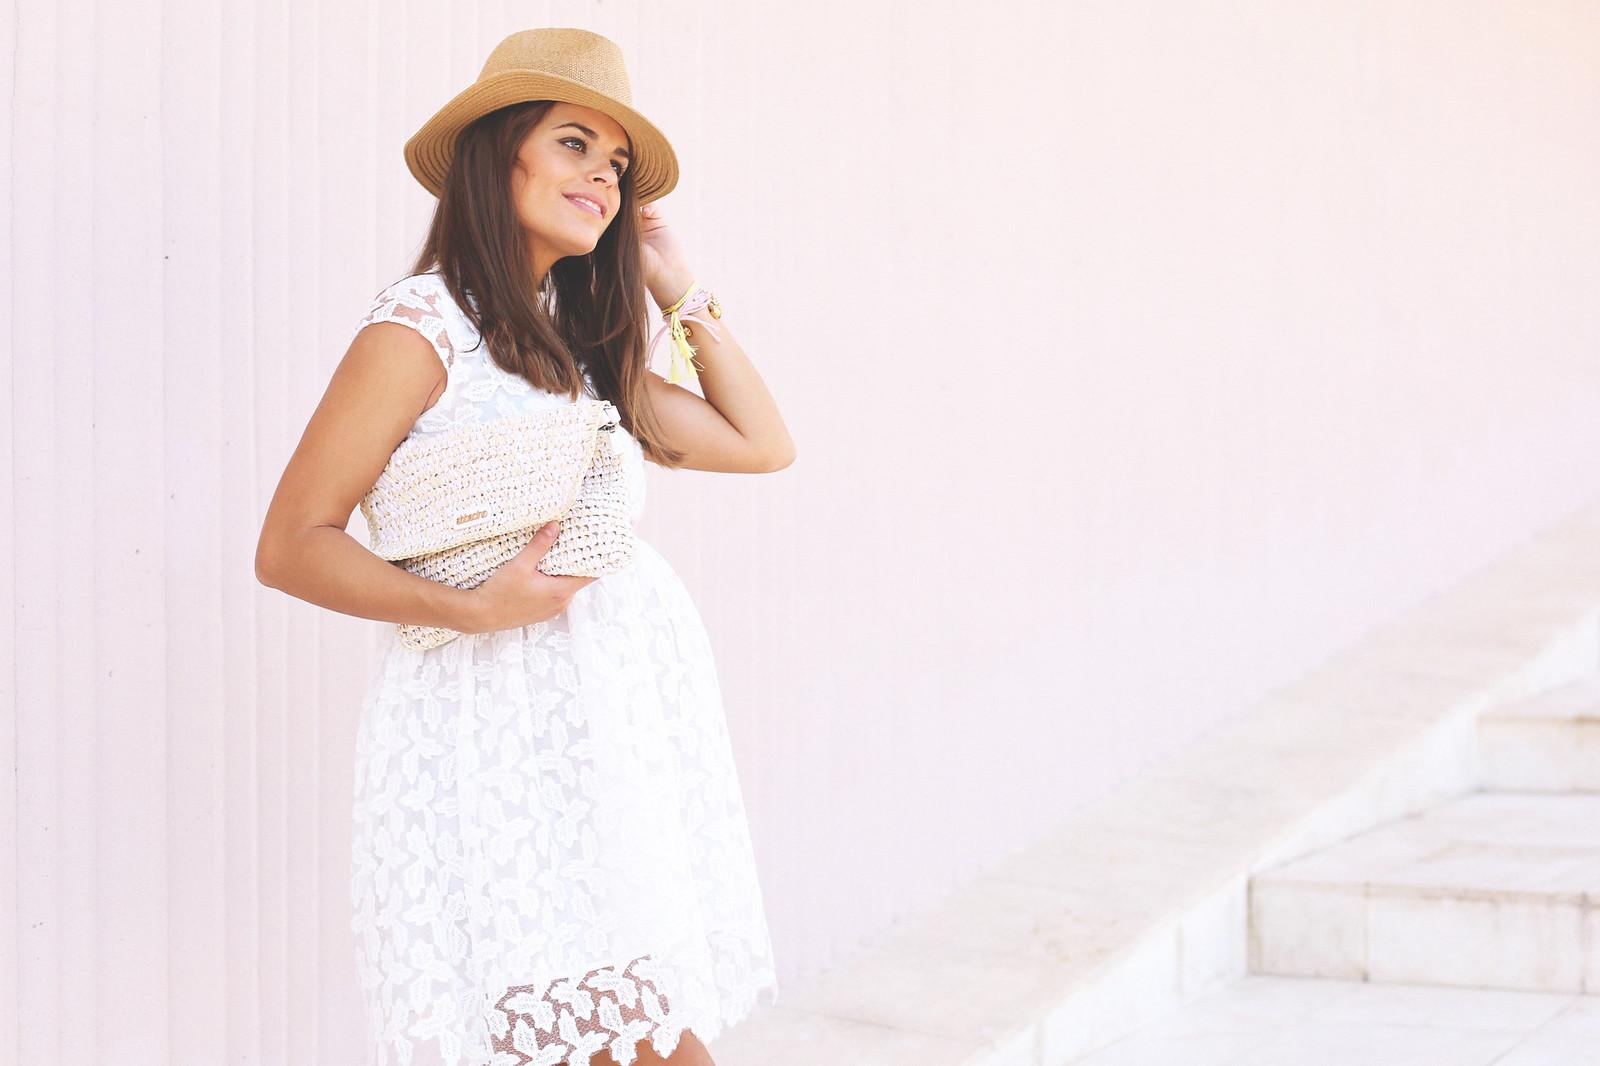 3. lace white short dress - jessie chanes - pregnancy